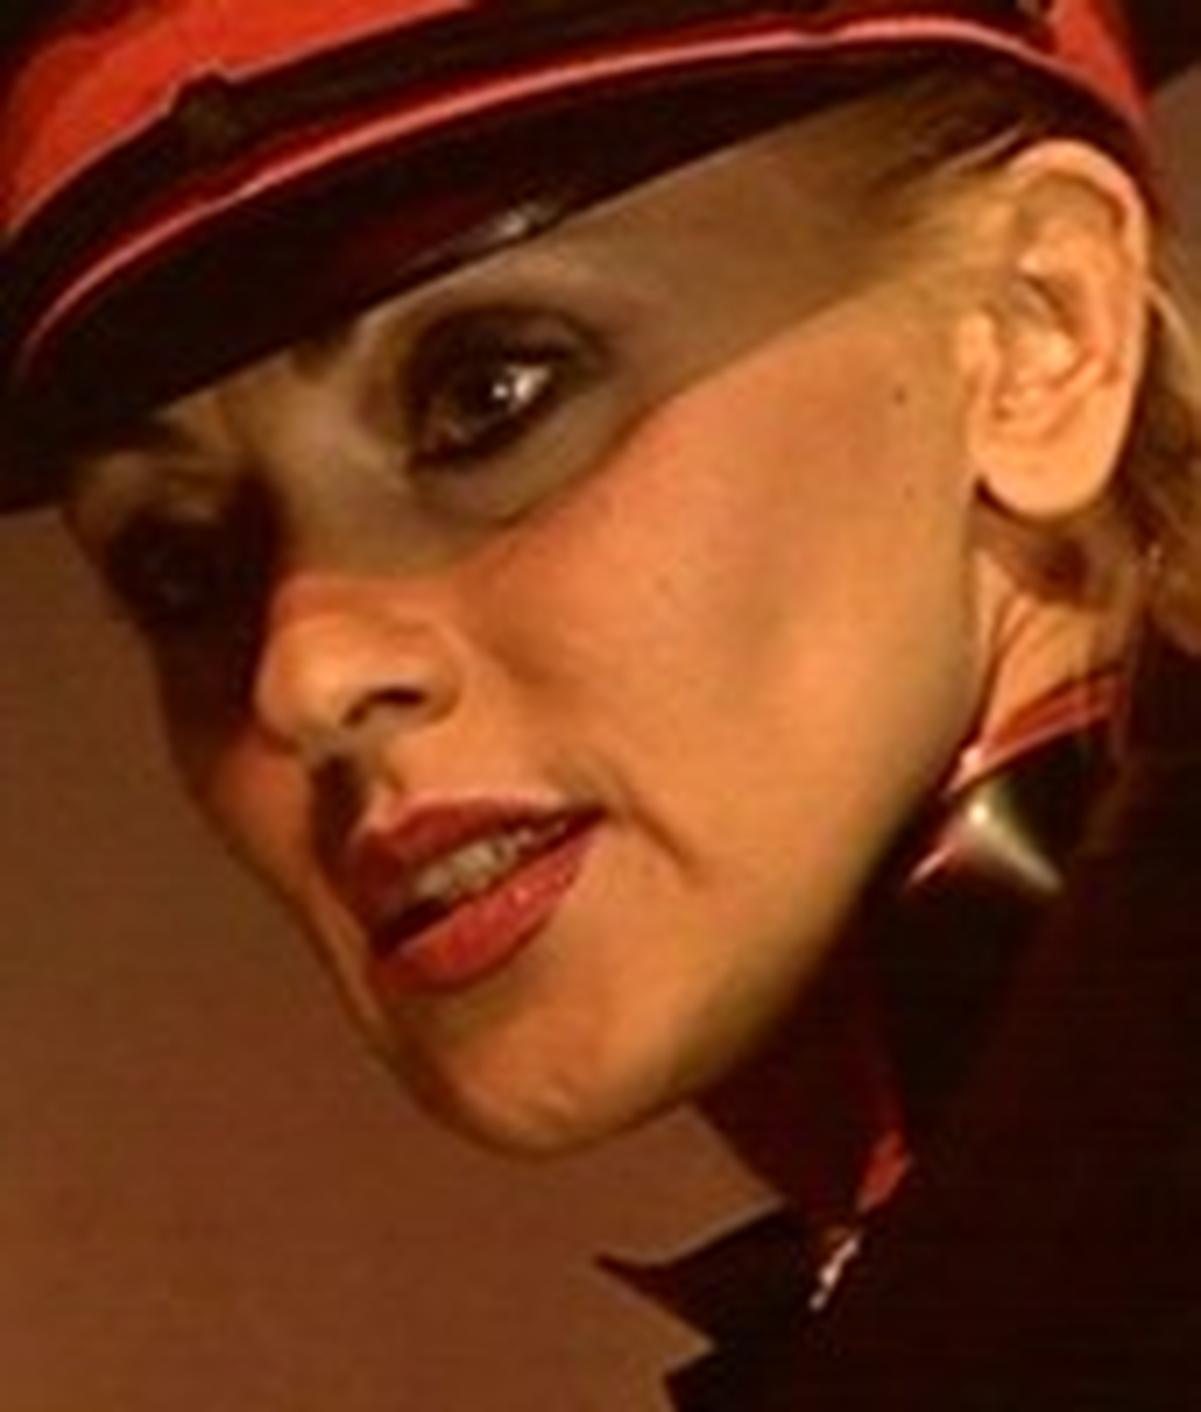 Lady Carla von Kemnitz